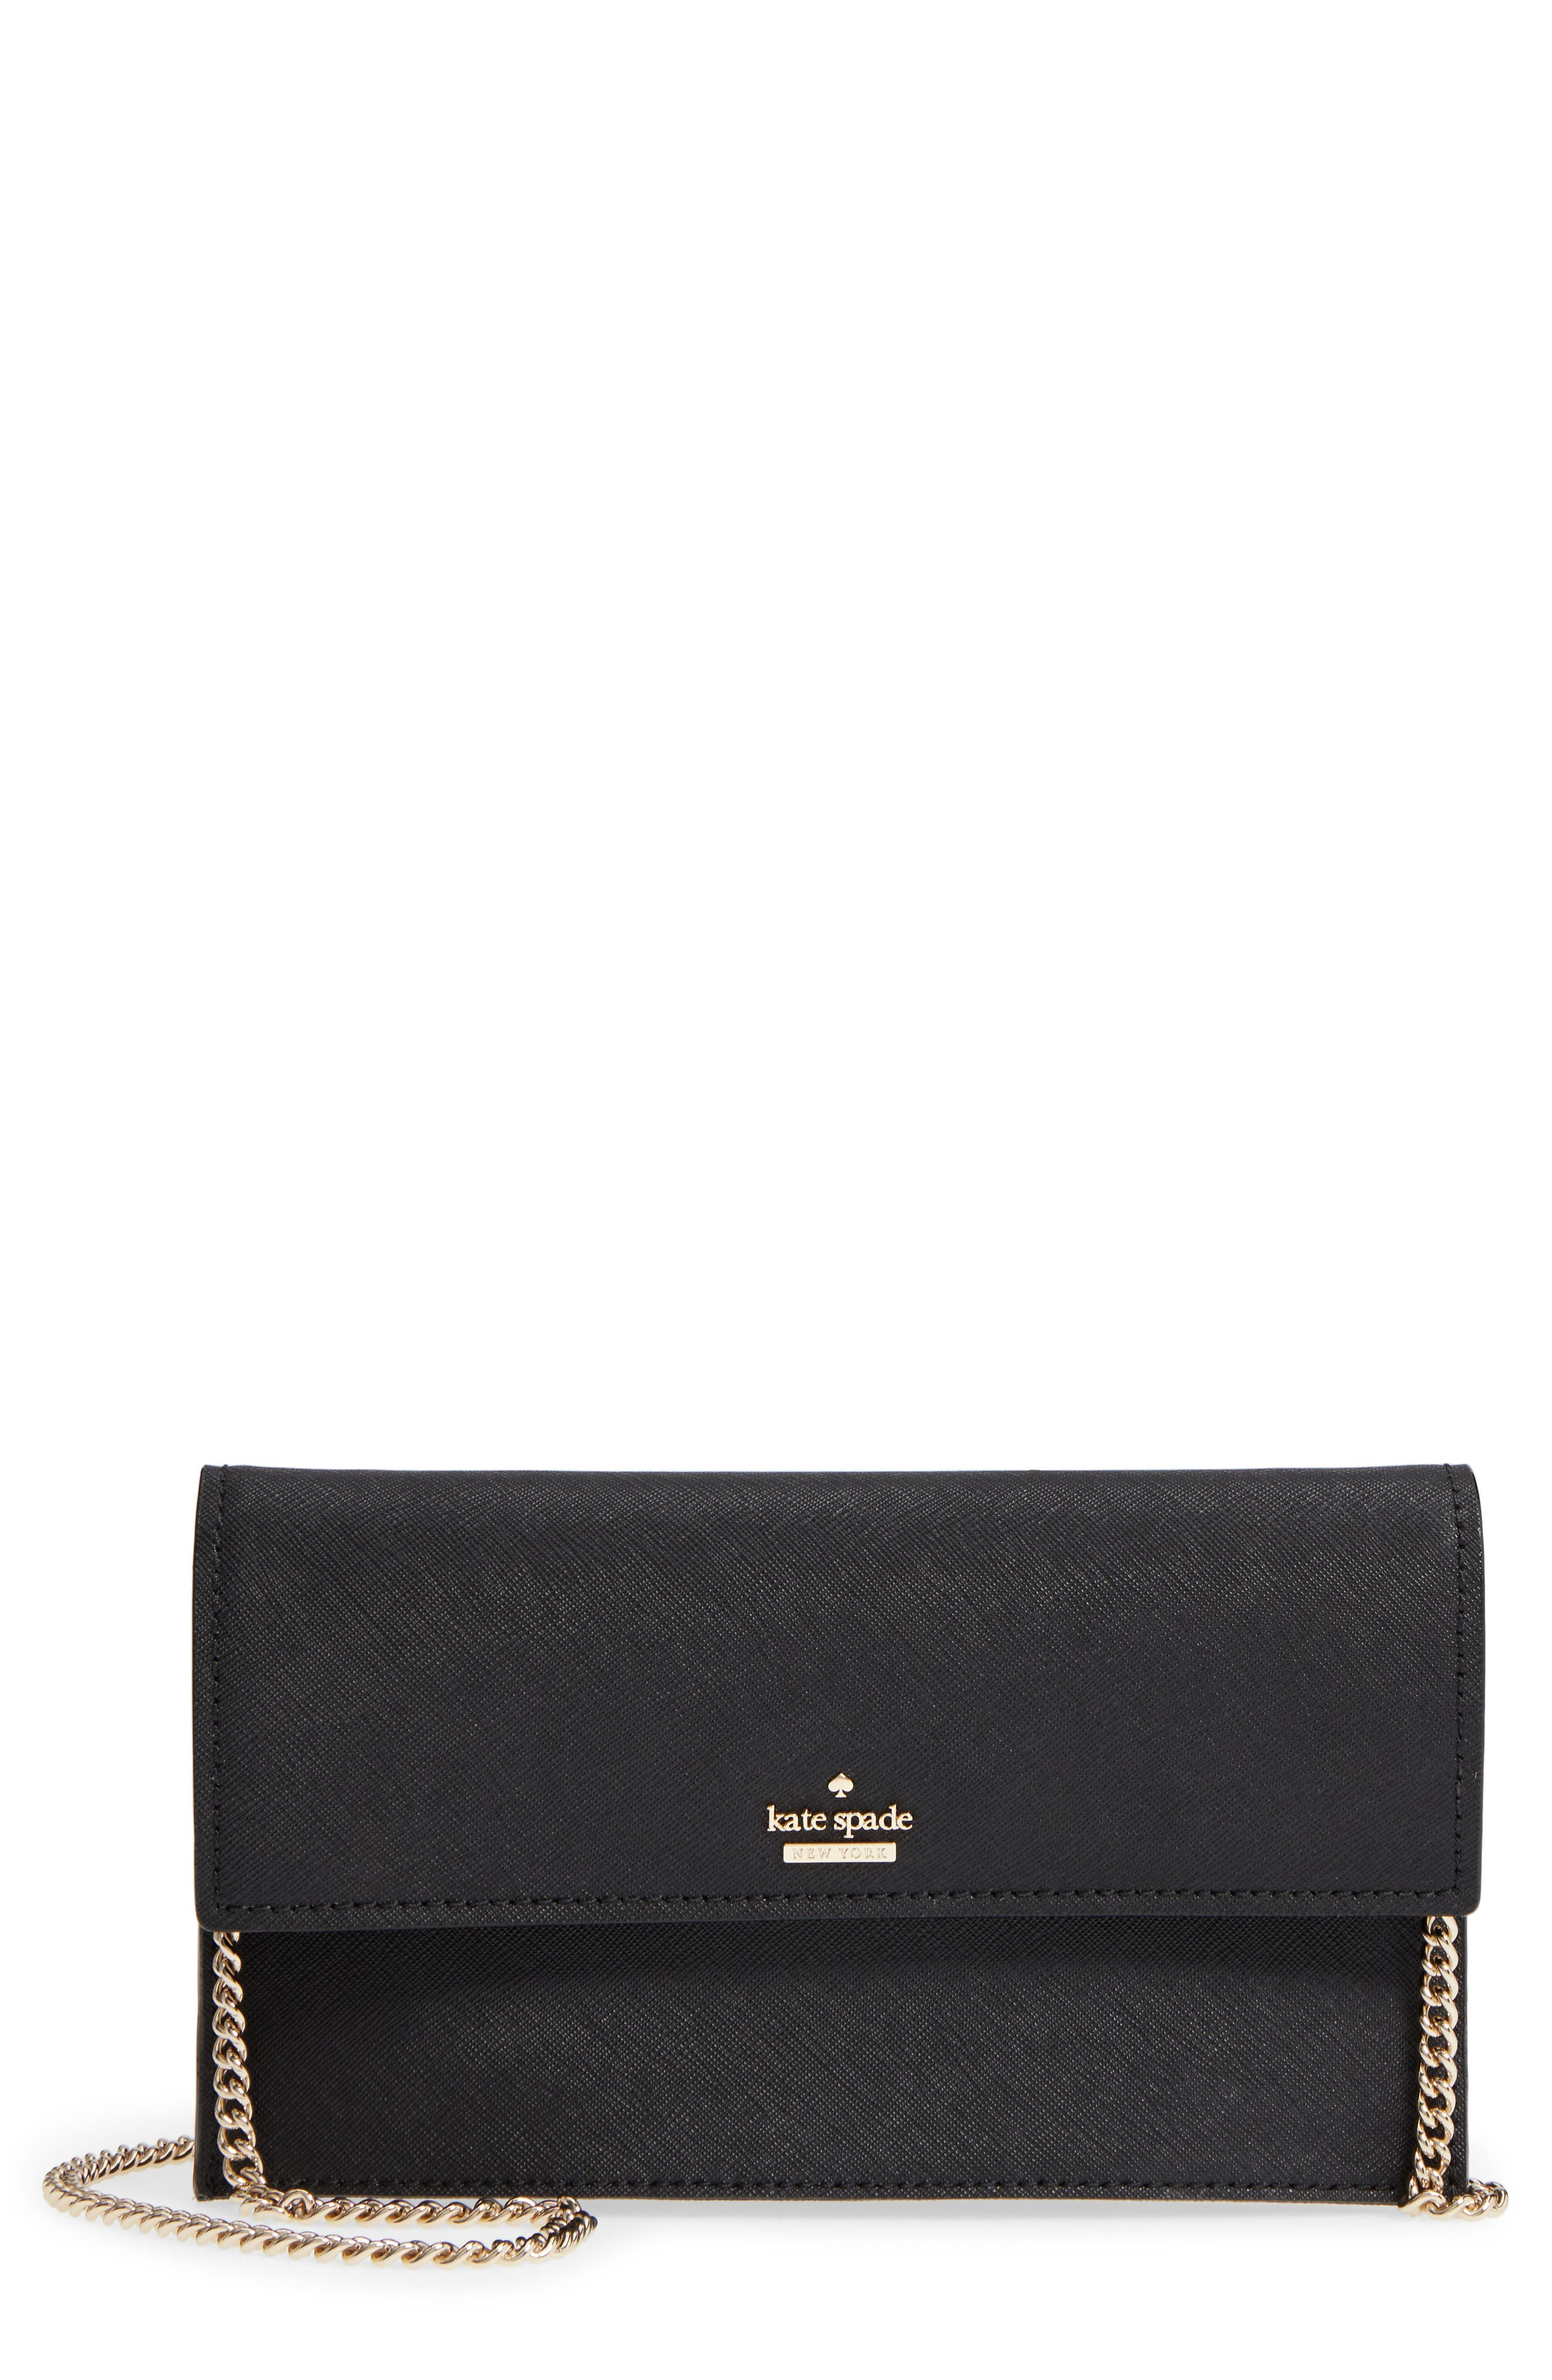 kate spade new york cameron street - brennan leather wallet & card case